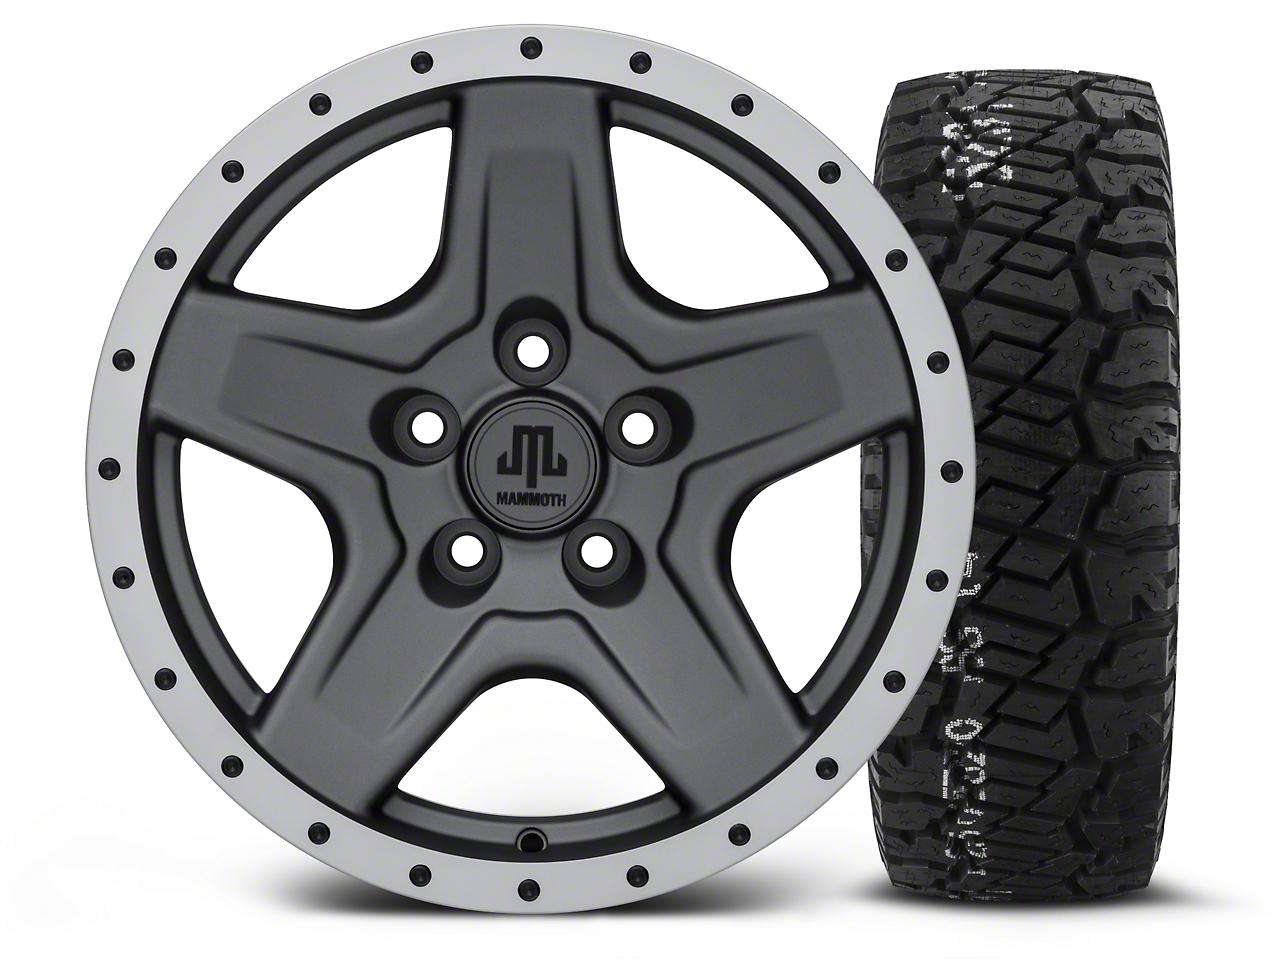 Mammoth Boulder Beadlock Style Charcoal 16x8 Wheel & BF Goodrich All Terrain TA KO2 315/75R16 Tire Kit (87-06 Jeep Wrangler YJ & TJ)